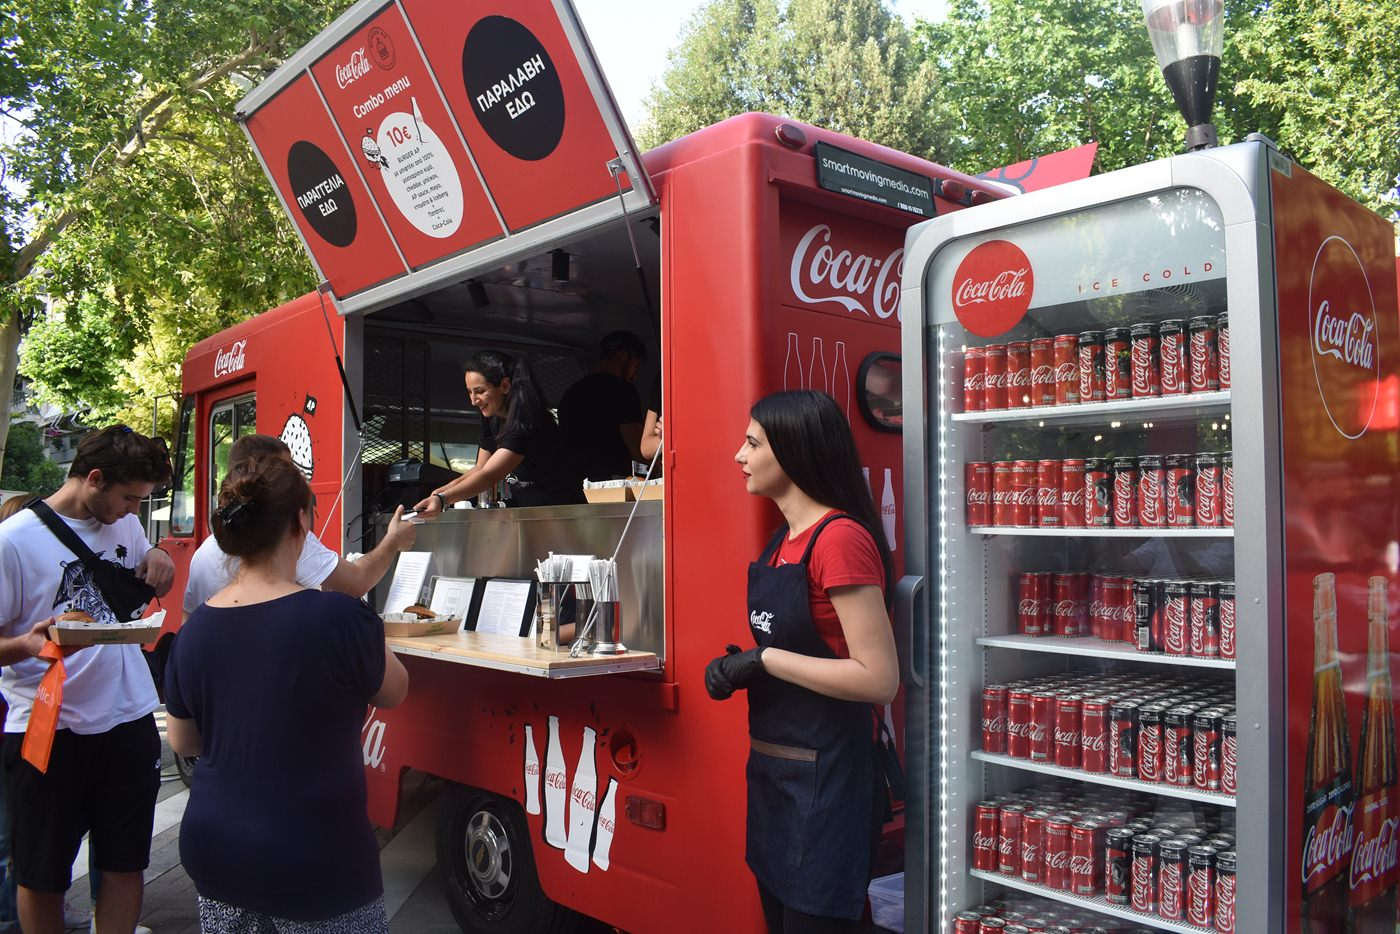 Burgers για τους Λαρισαίους έφτιαξε ο Άκης Πετρετζίκης - Το Coca-Cola & Akis Food Tour Festival έφτασε στην πόλη (φωτο)